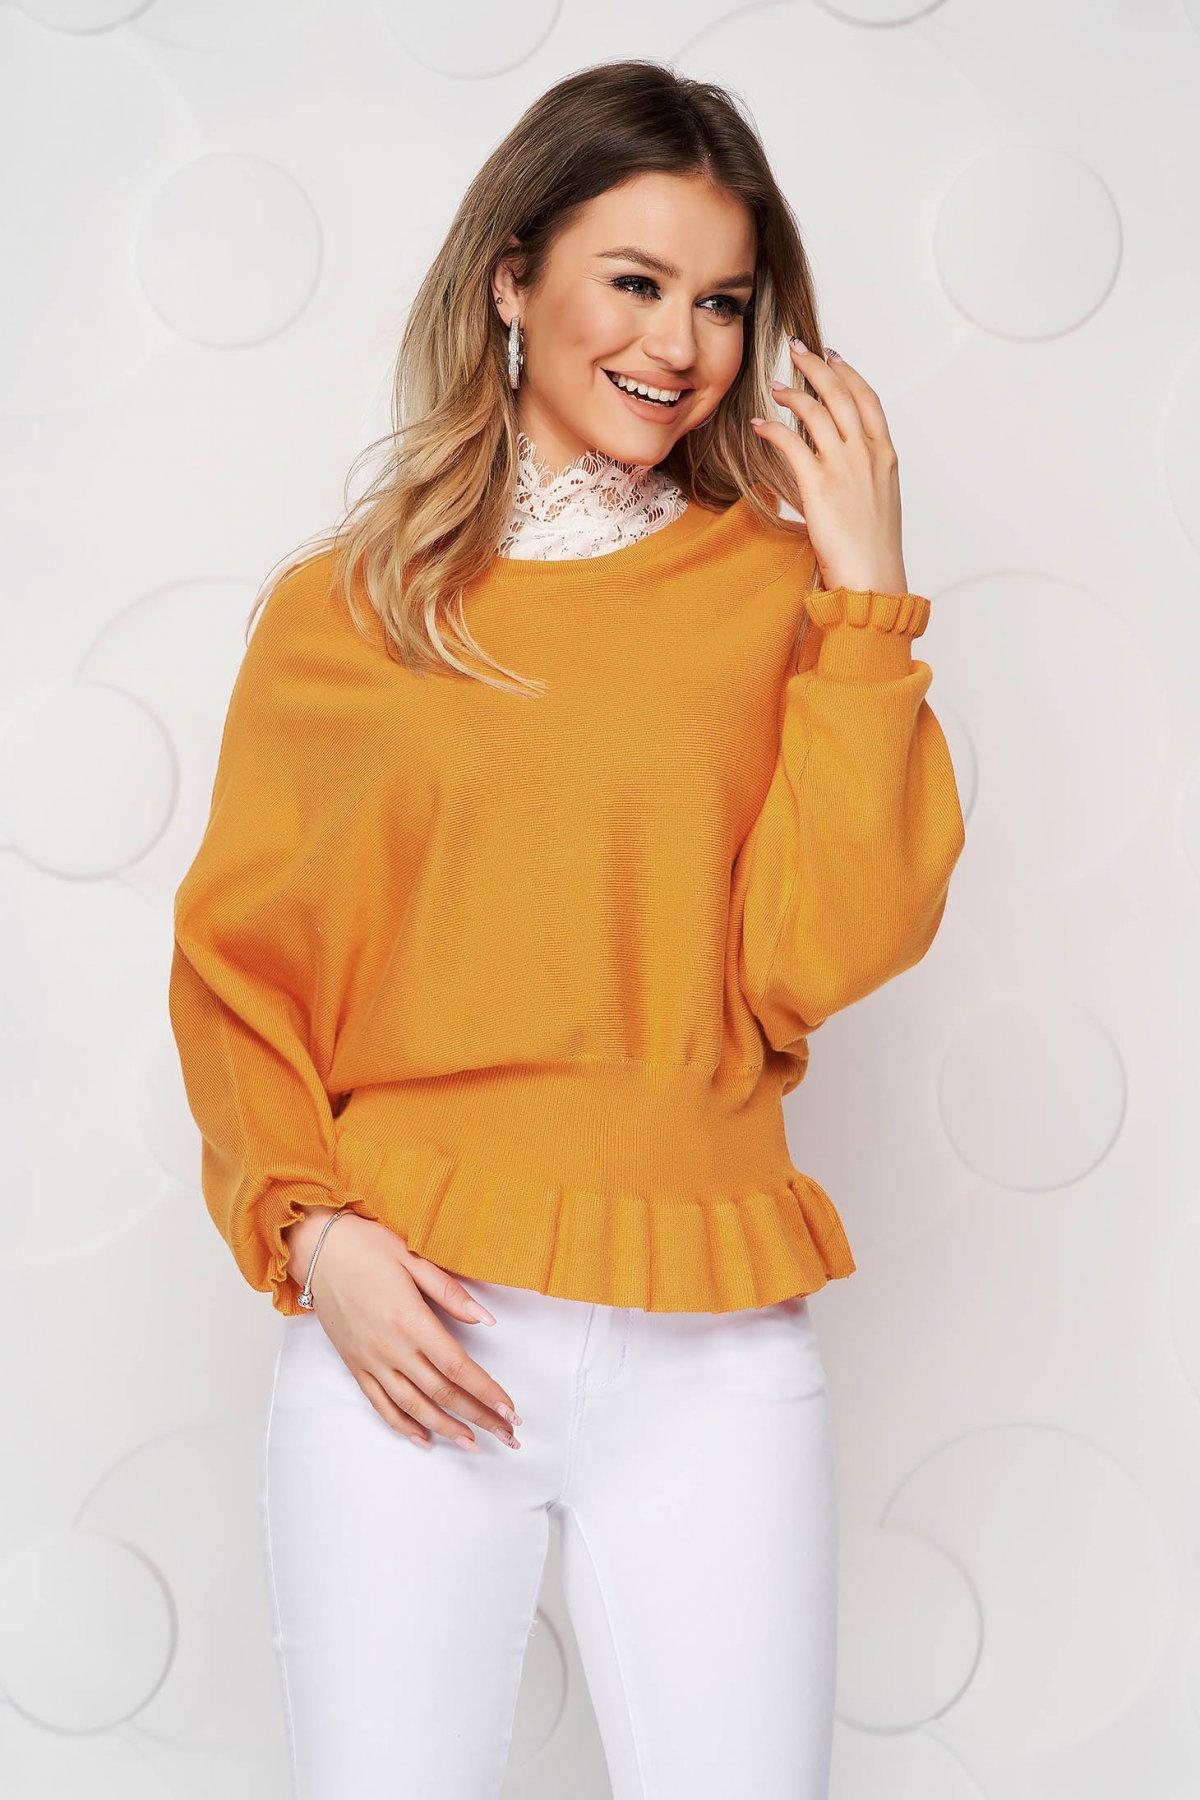 Bluza dama SunShine mustarie casual din tricot reiat elastic si fin cu volanase